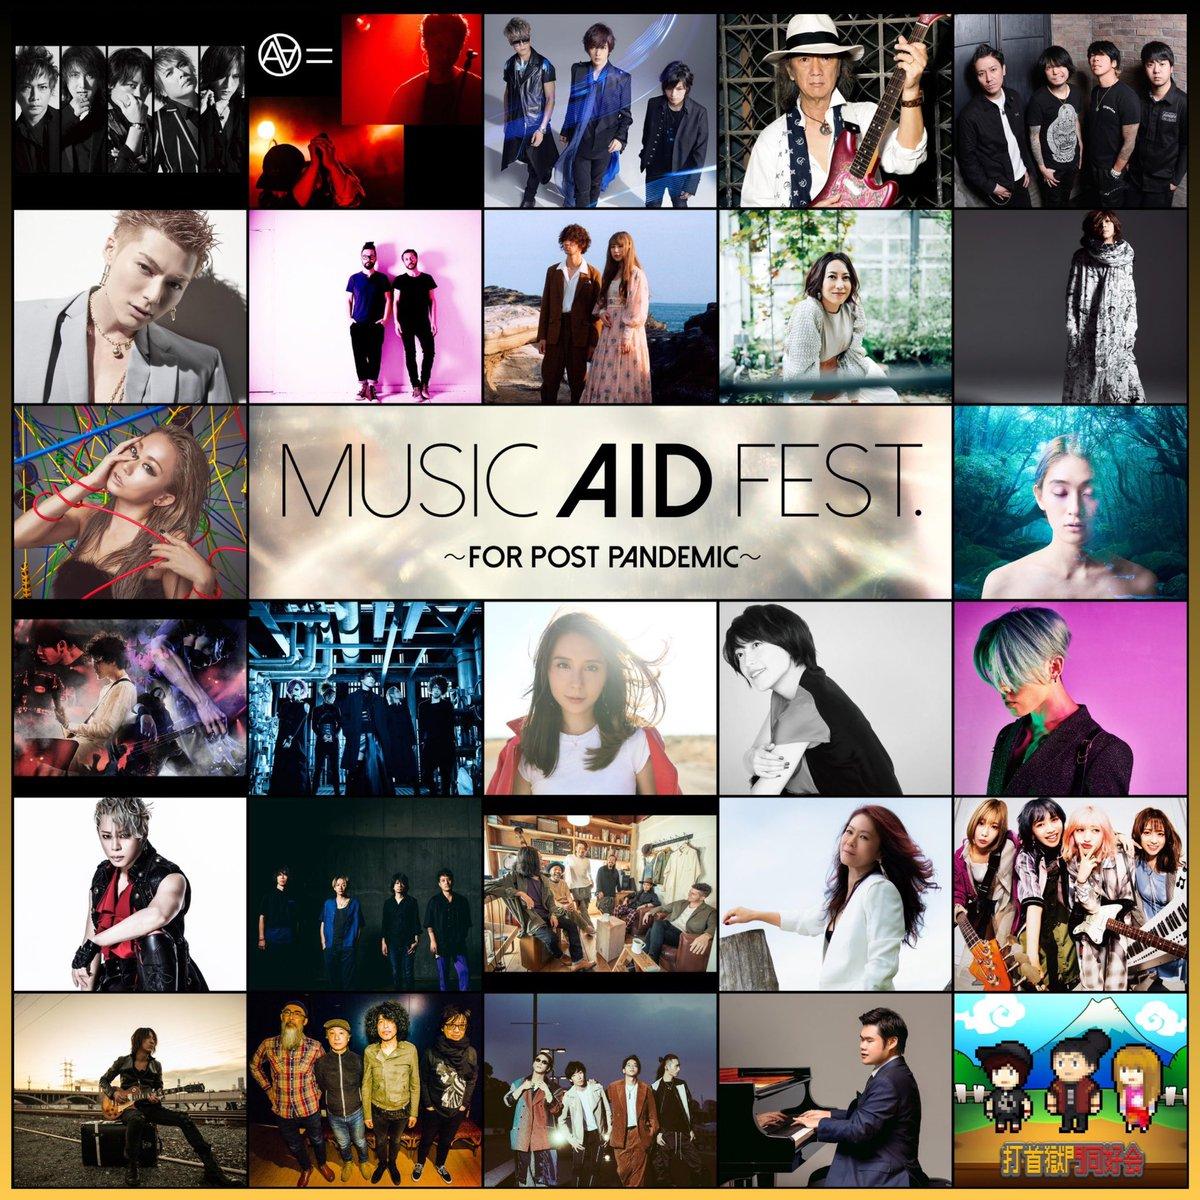 📺👀‼️『MUSIC AID FEST.〜FOR POST PANDEMIC〜』#MIYAVI も出演する3時間の生放送フェス、このあと18時からスタート!▶︎番組サイト:▶︎配信サイト:@MIYAVI_OFFICIAL #musicaidfest